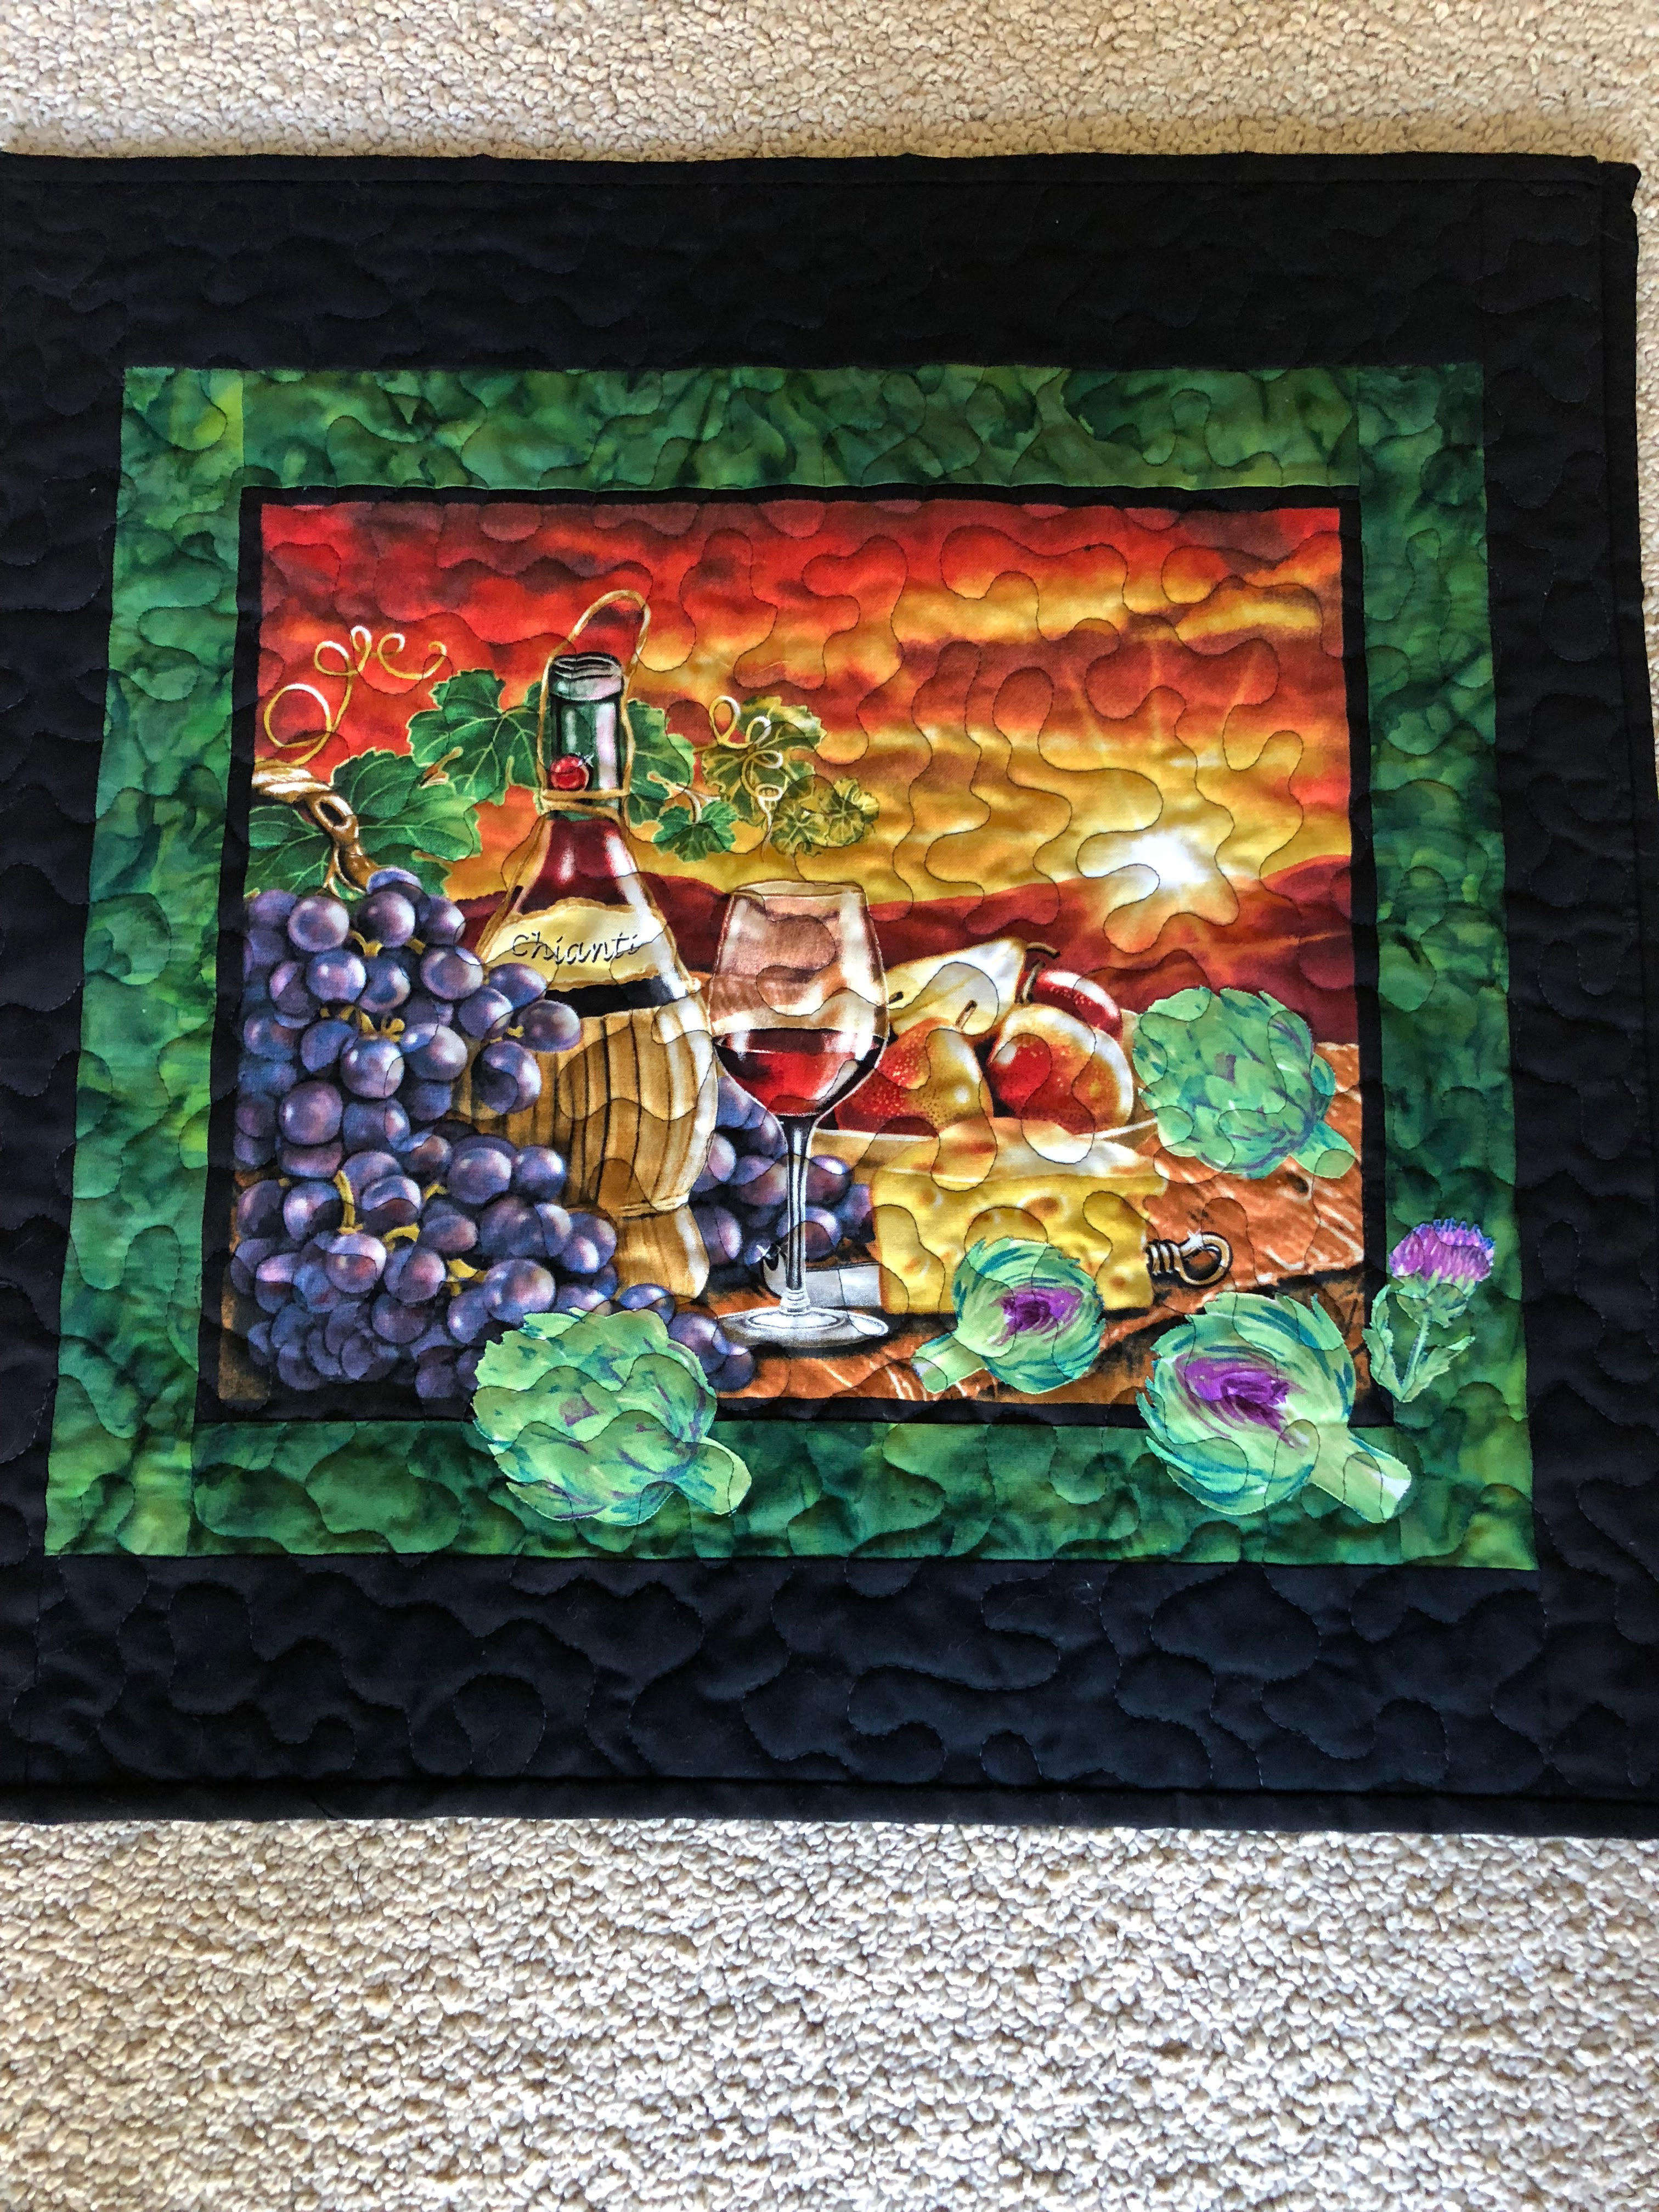 Artichoke festival quilt challenge 2nd place winner